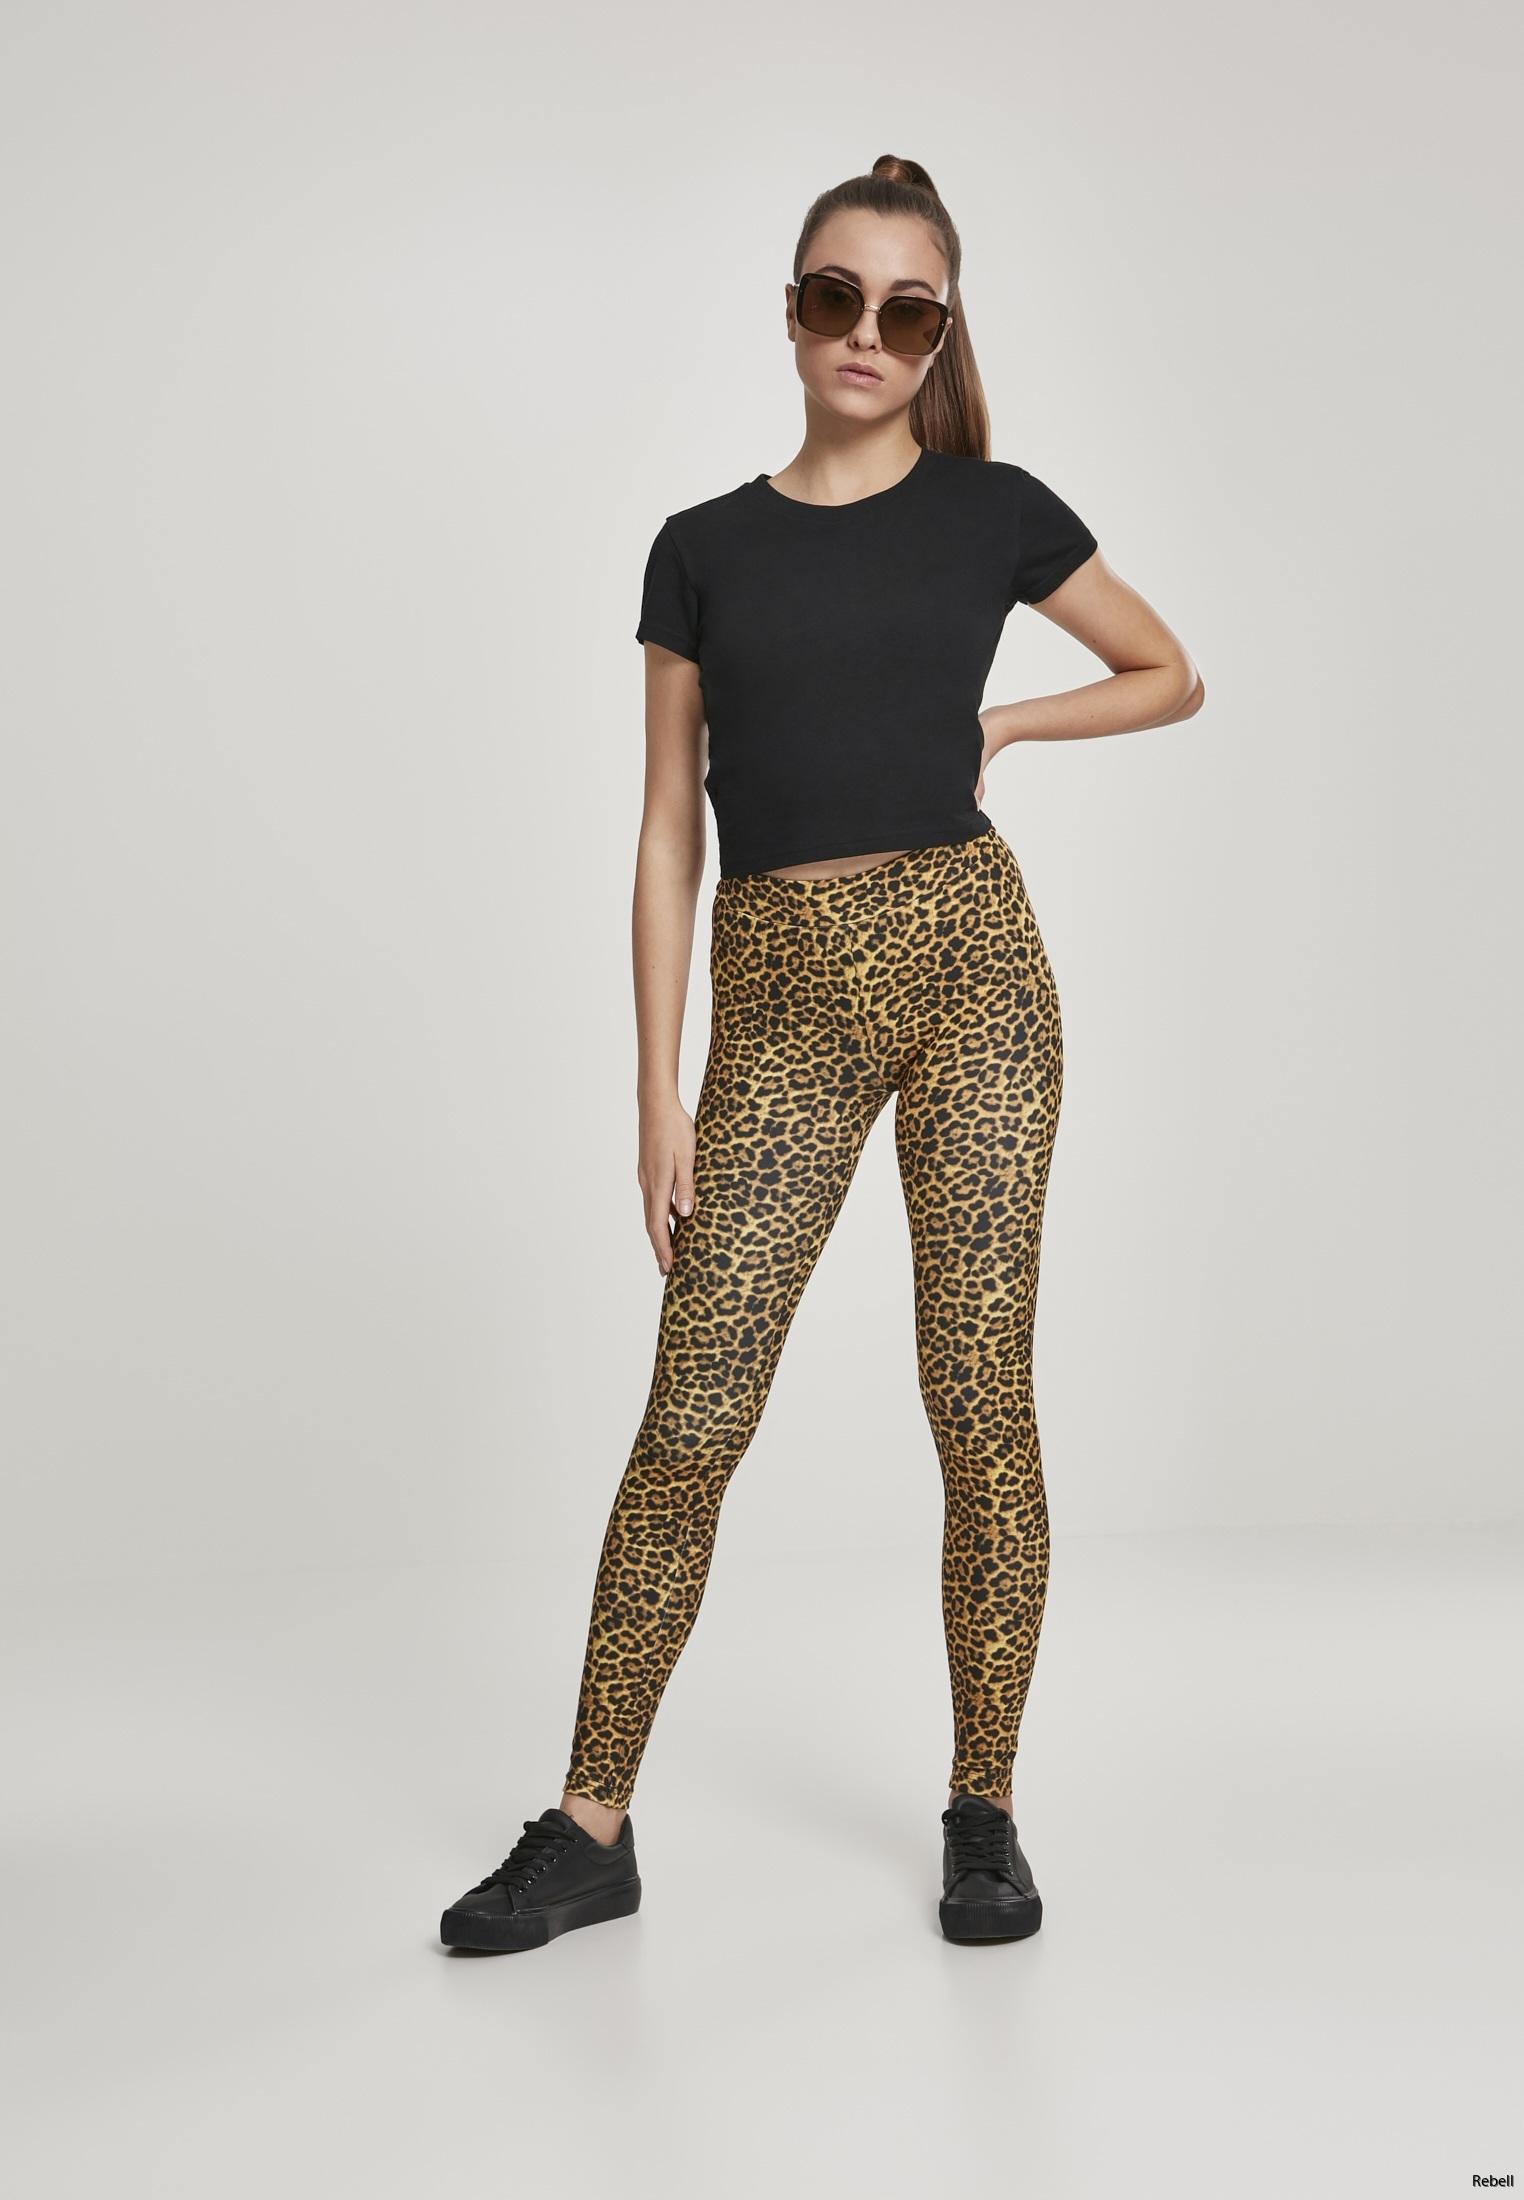 Leopard leggings leopardkläder leoparleggings leopardbyxor rock rocknroll rockabilly